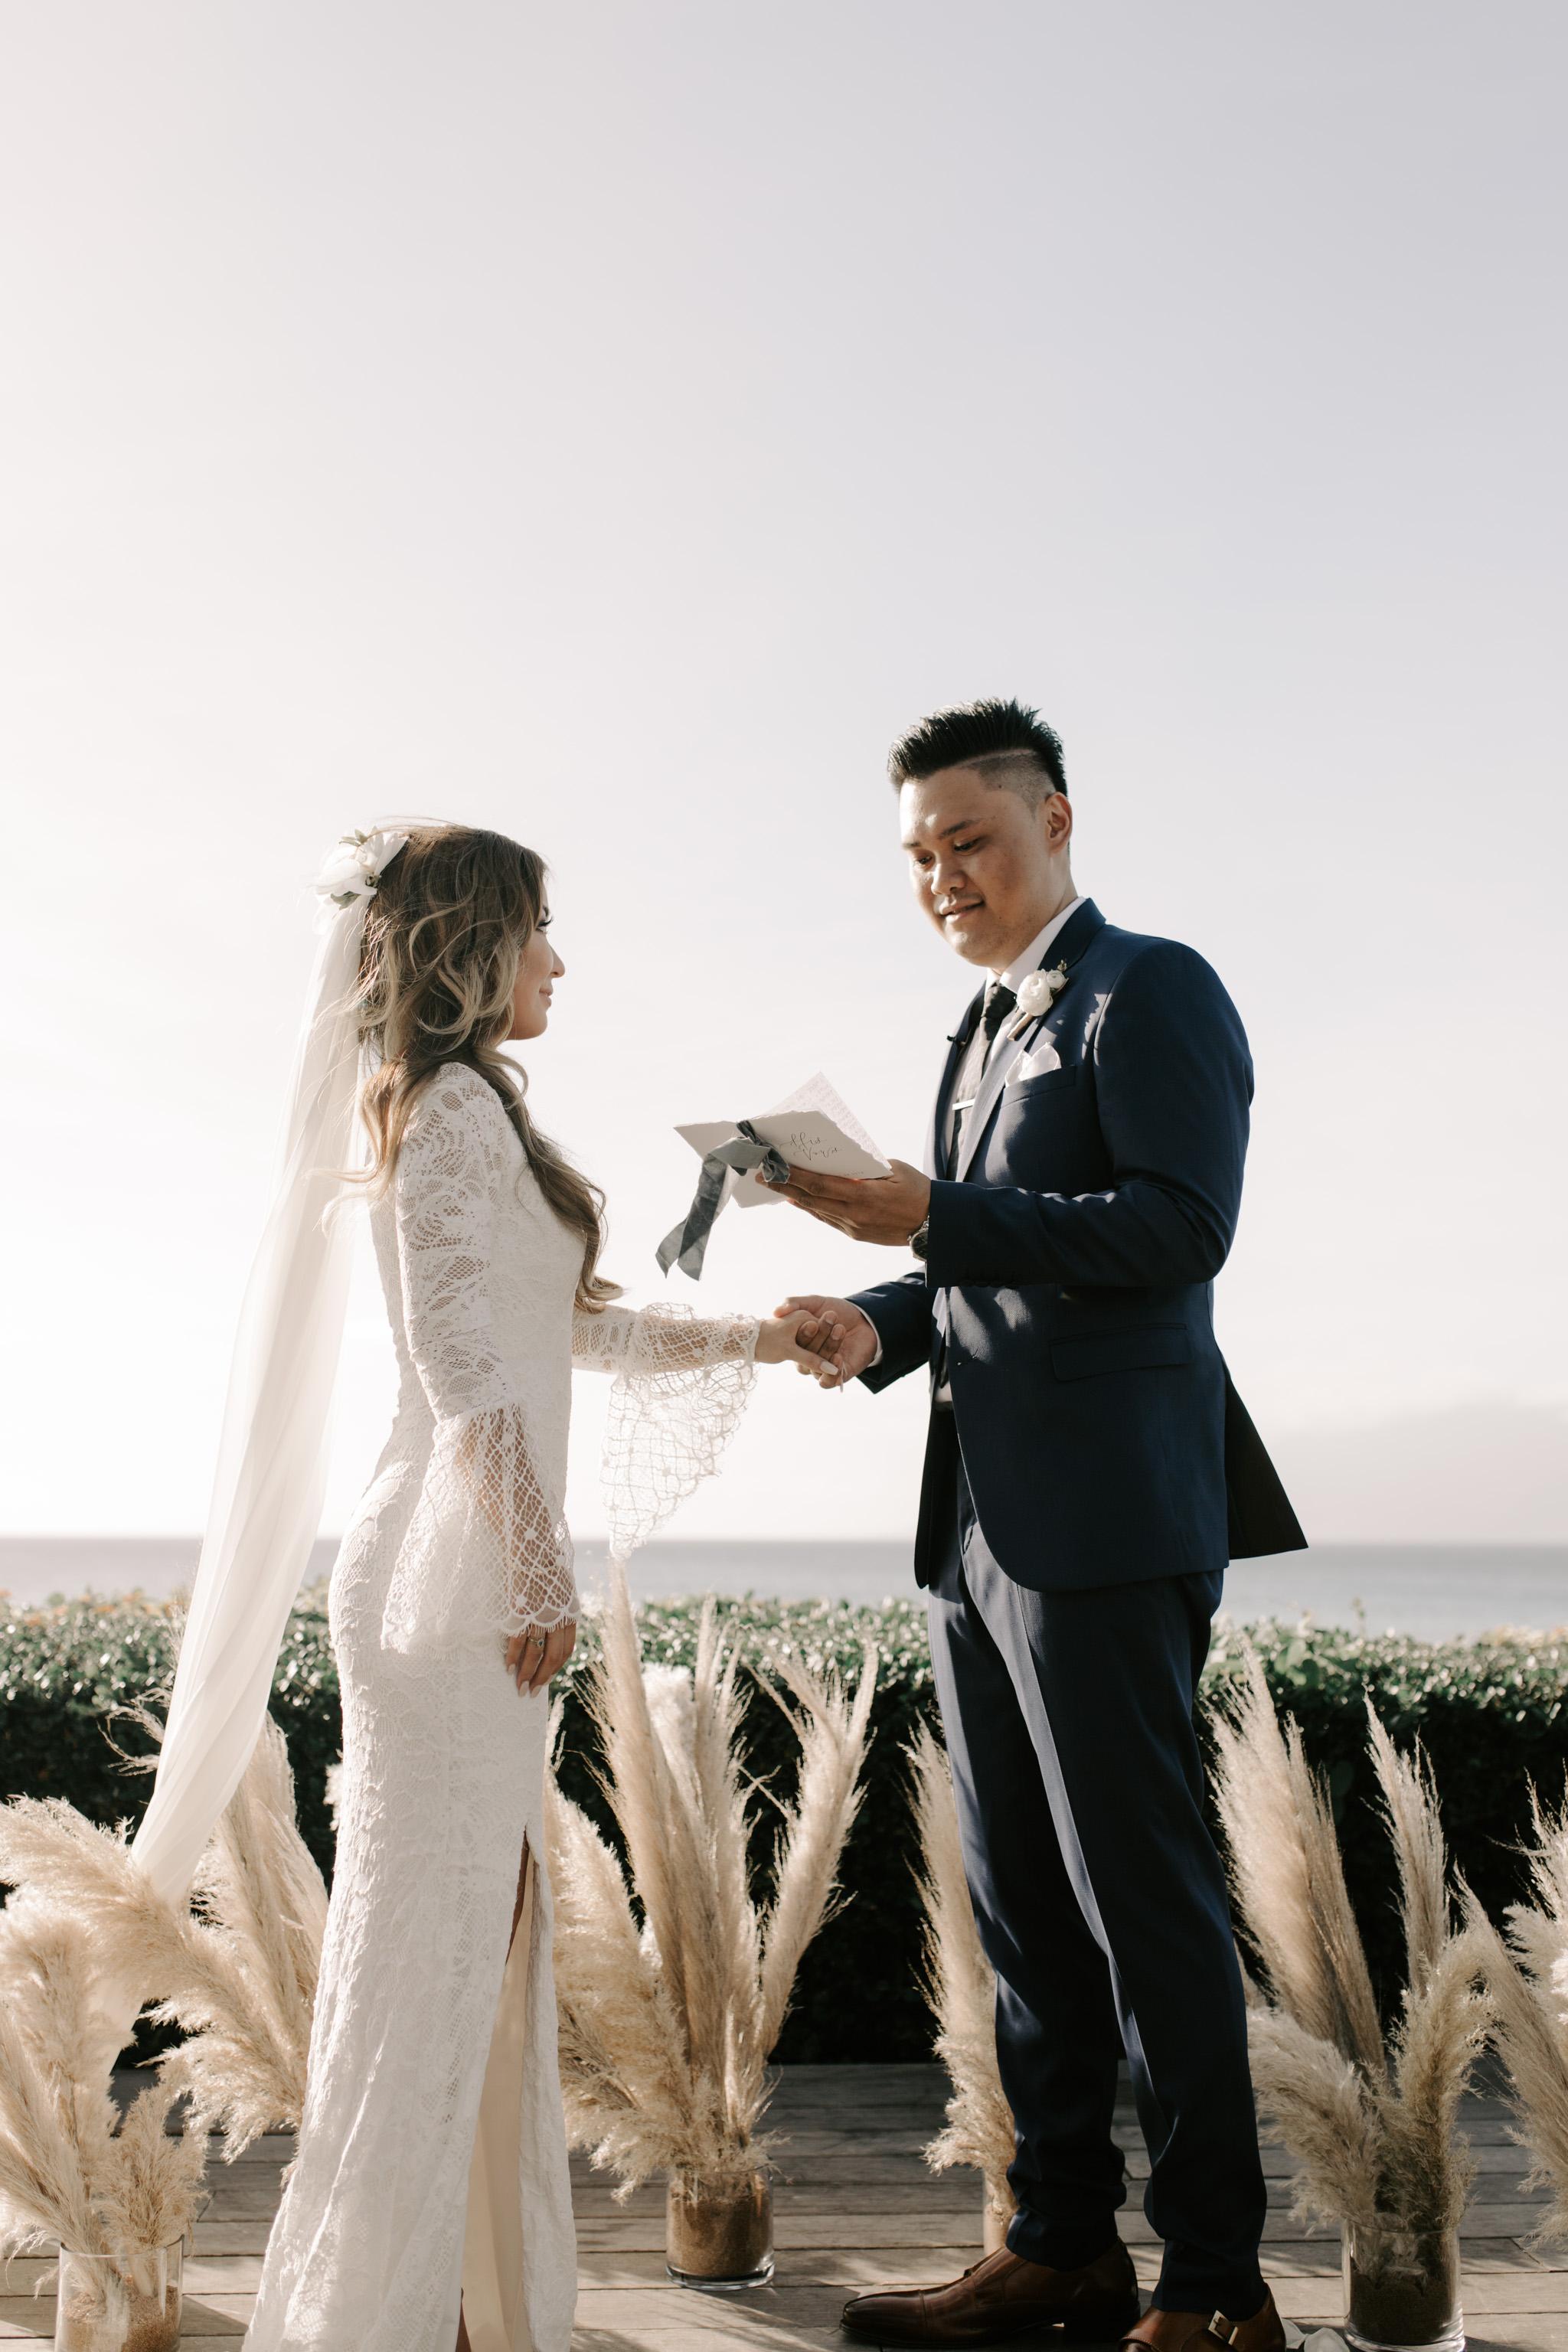 Groom reading his vows   Merriman's Kapalua Maui wedding by Hawaii wedding photographer Desiree Leilani